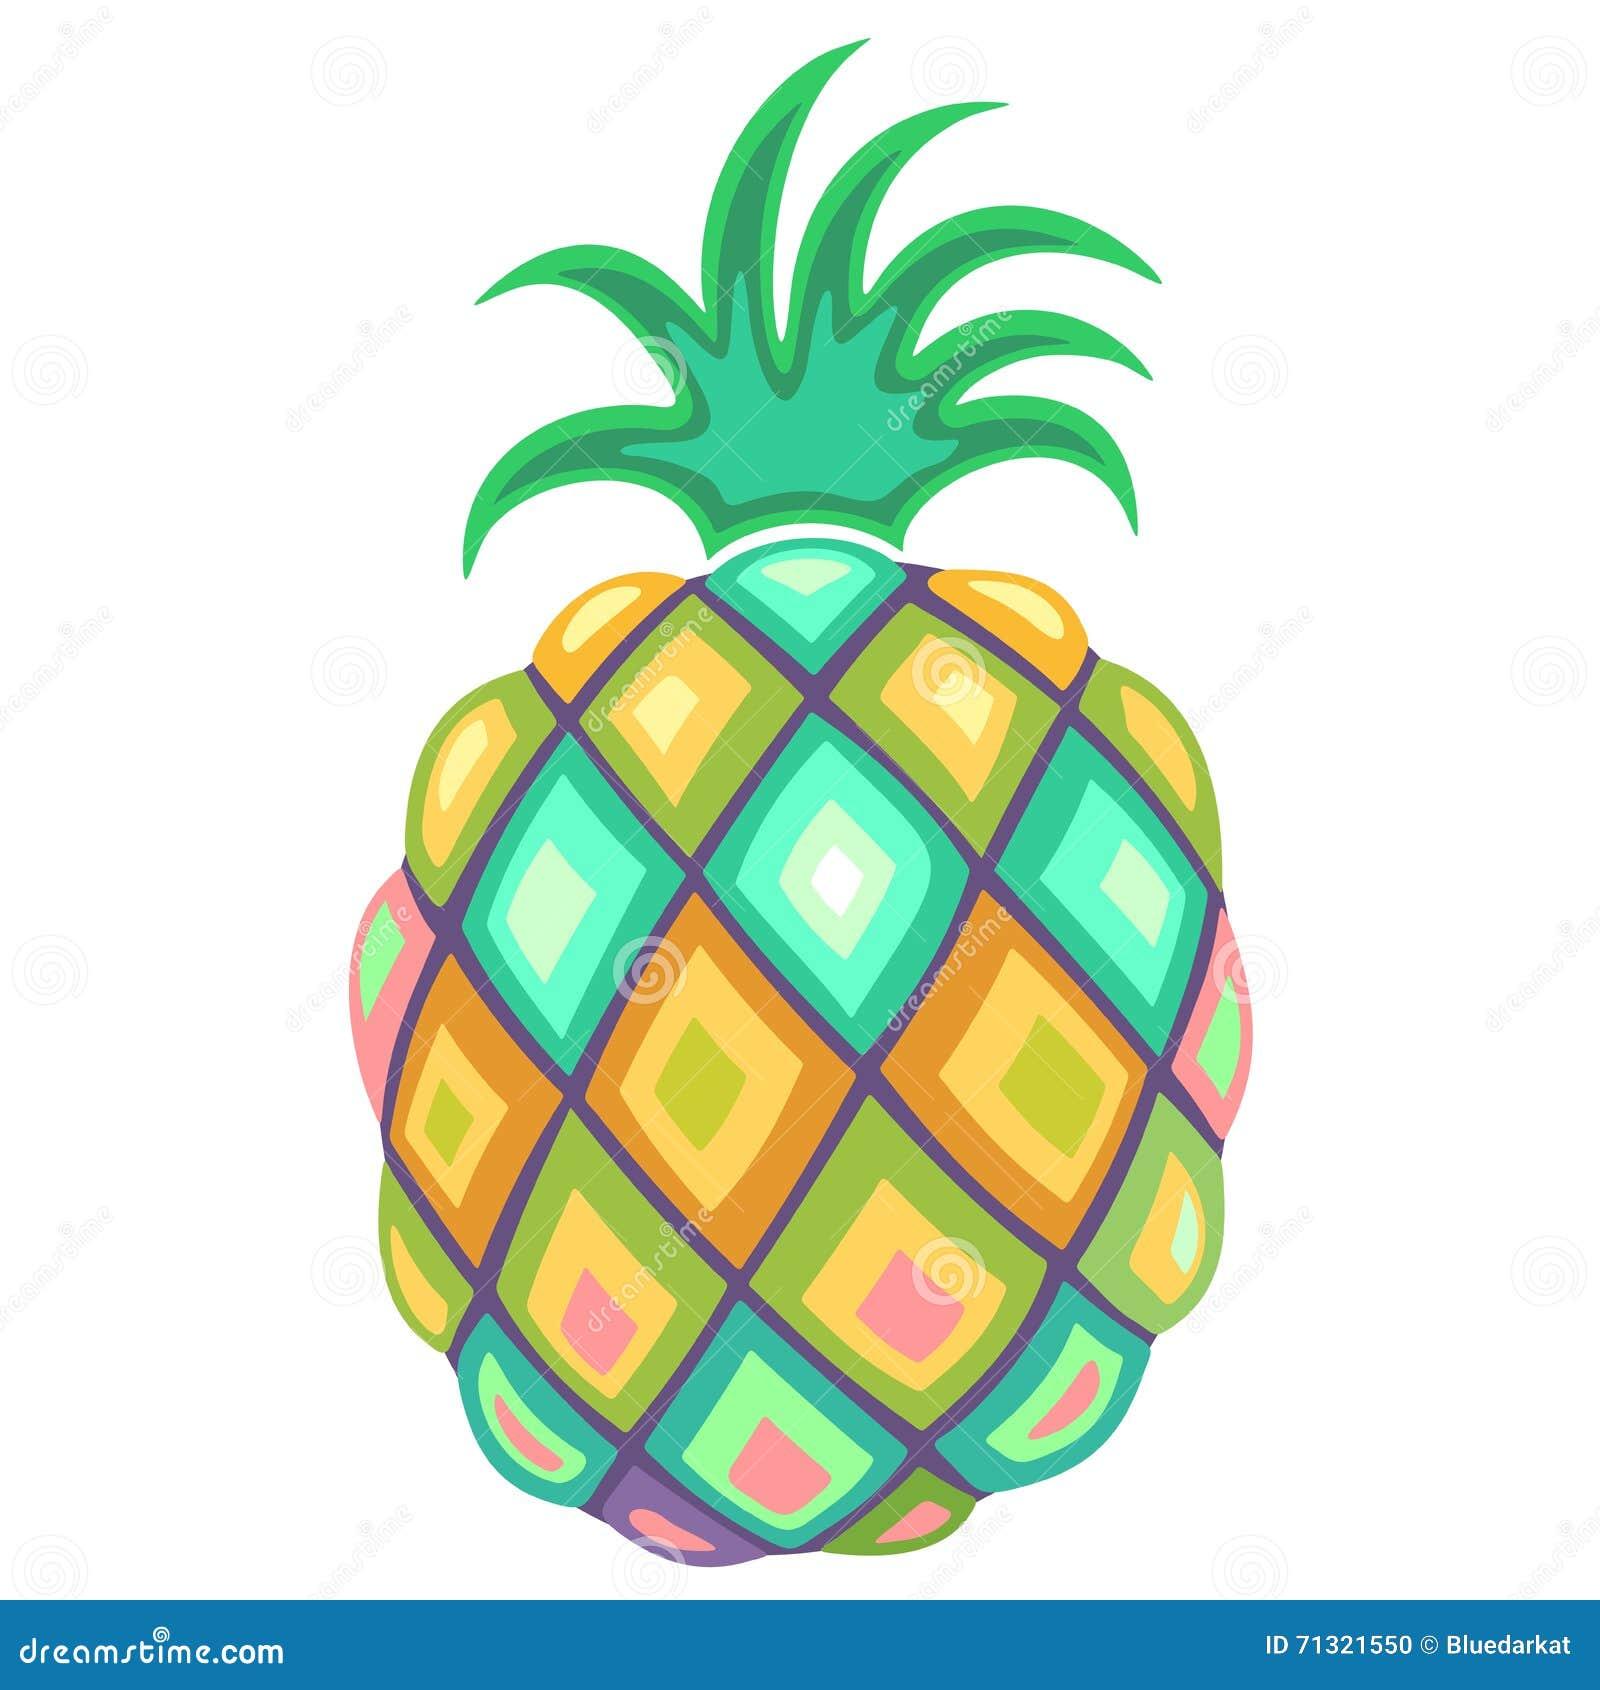 Pineapple Pastel Colors